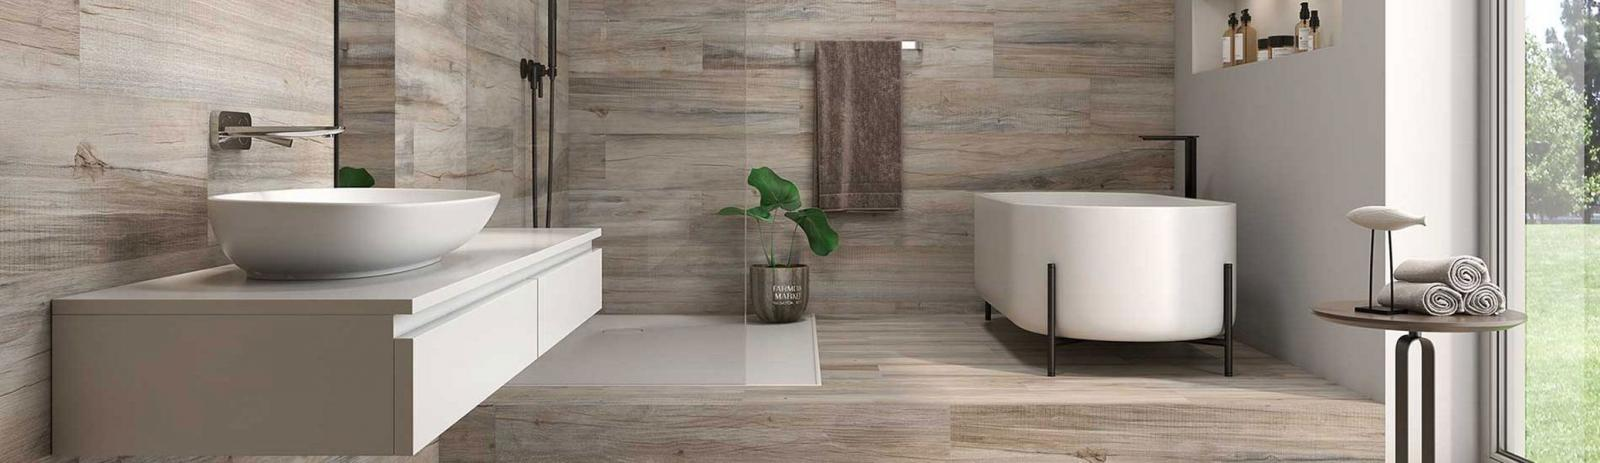 banner-jazz-wood-look-itt-ceramic-spanish-floor-wall-tile